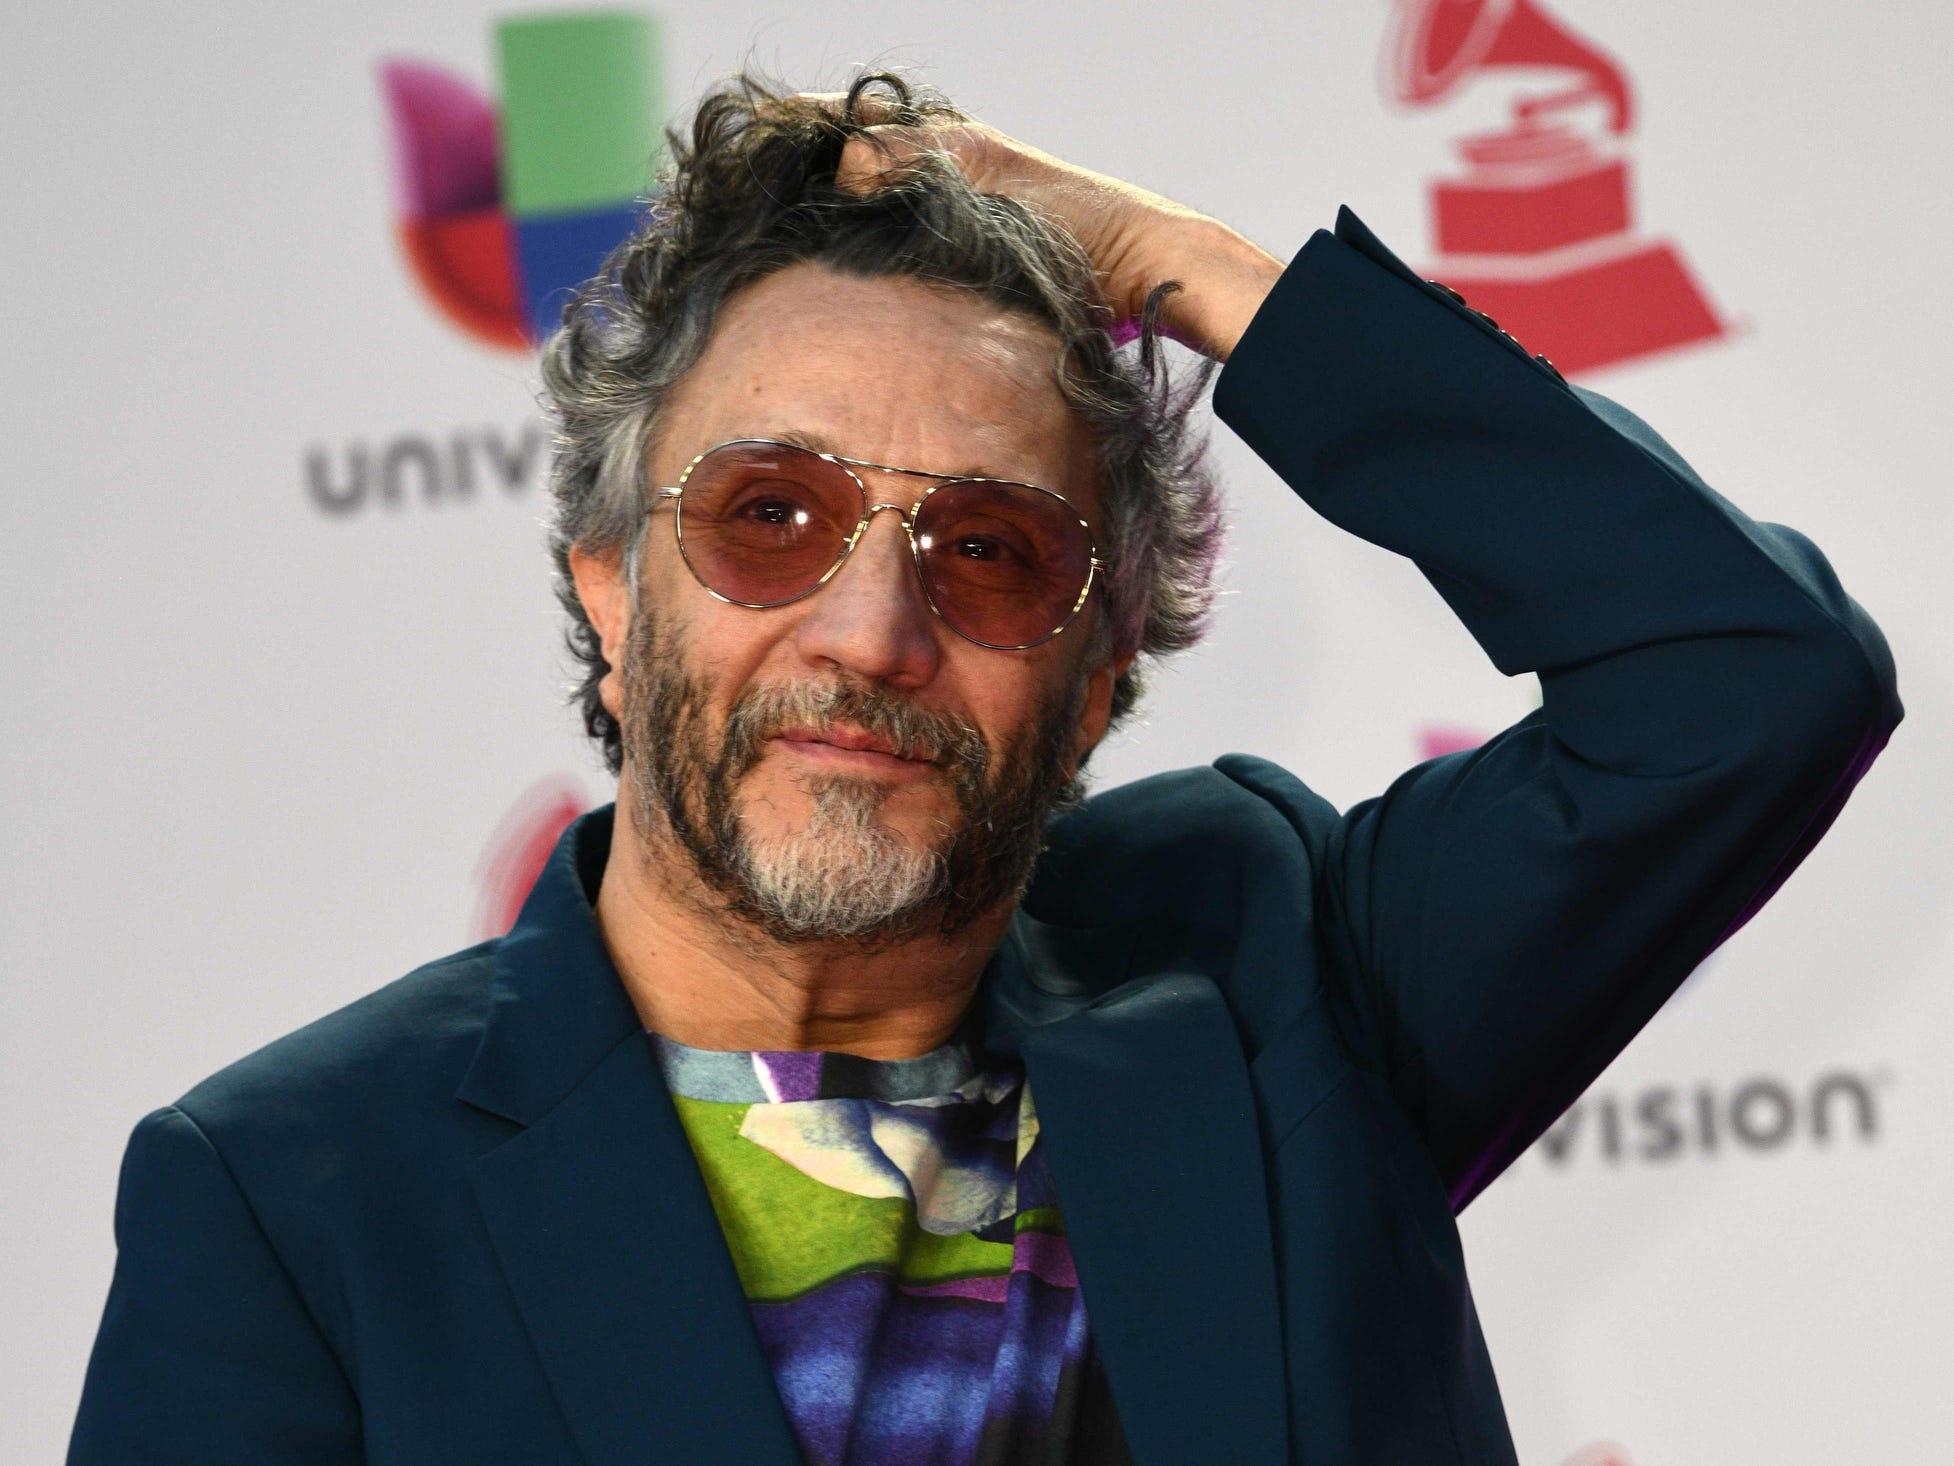 Argentine singer-songwriter Fito Paez